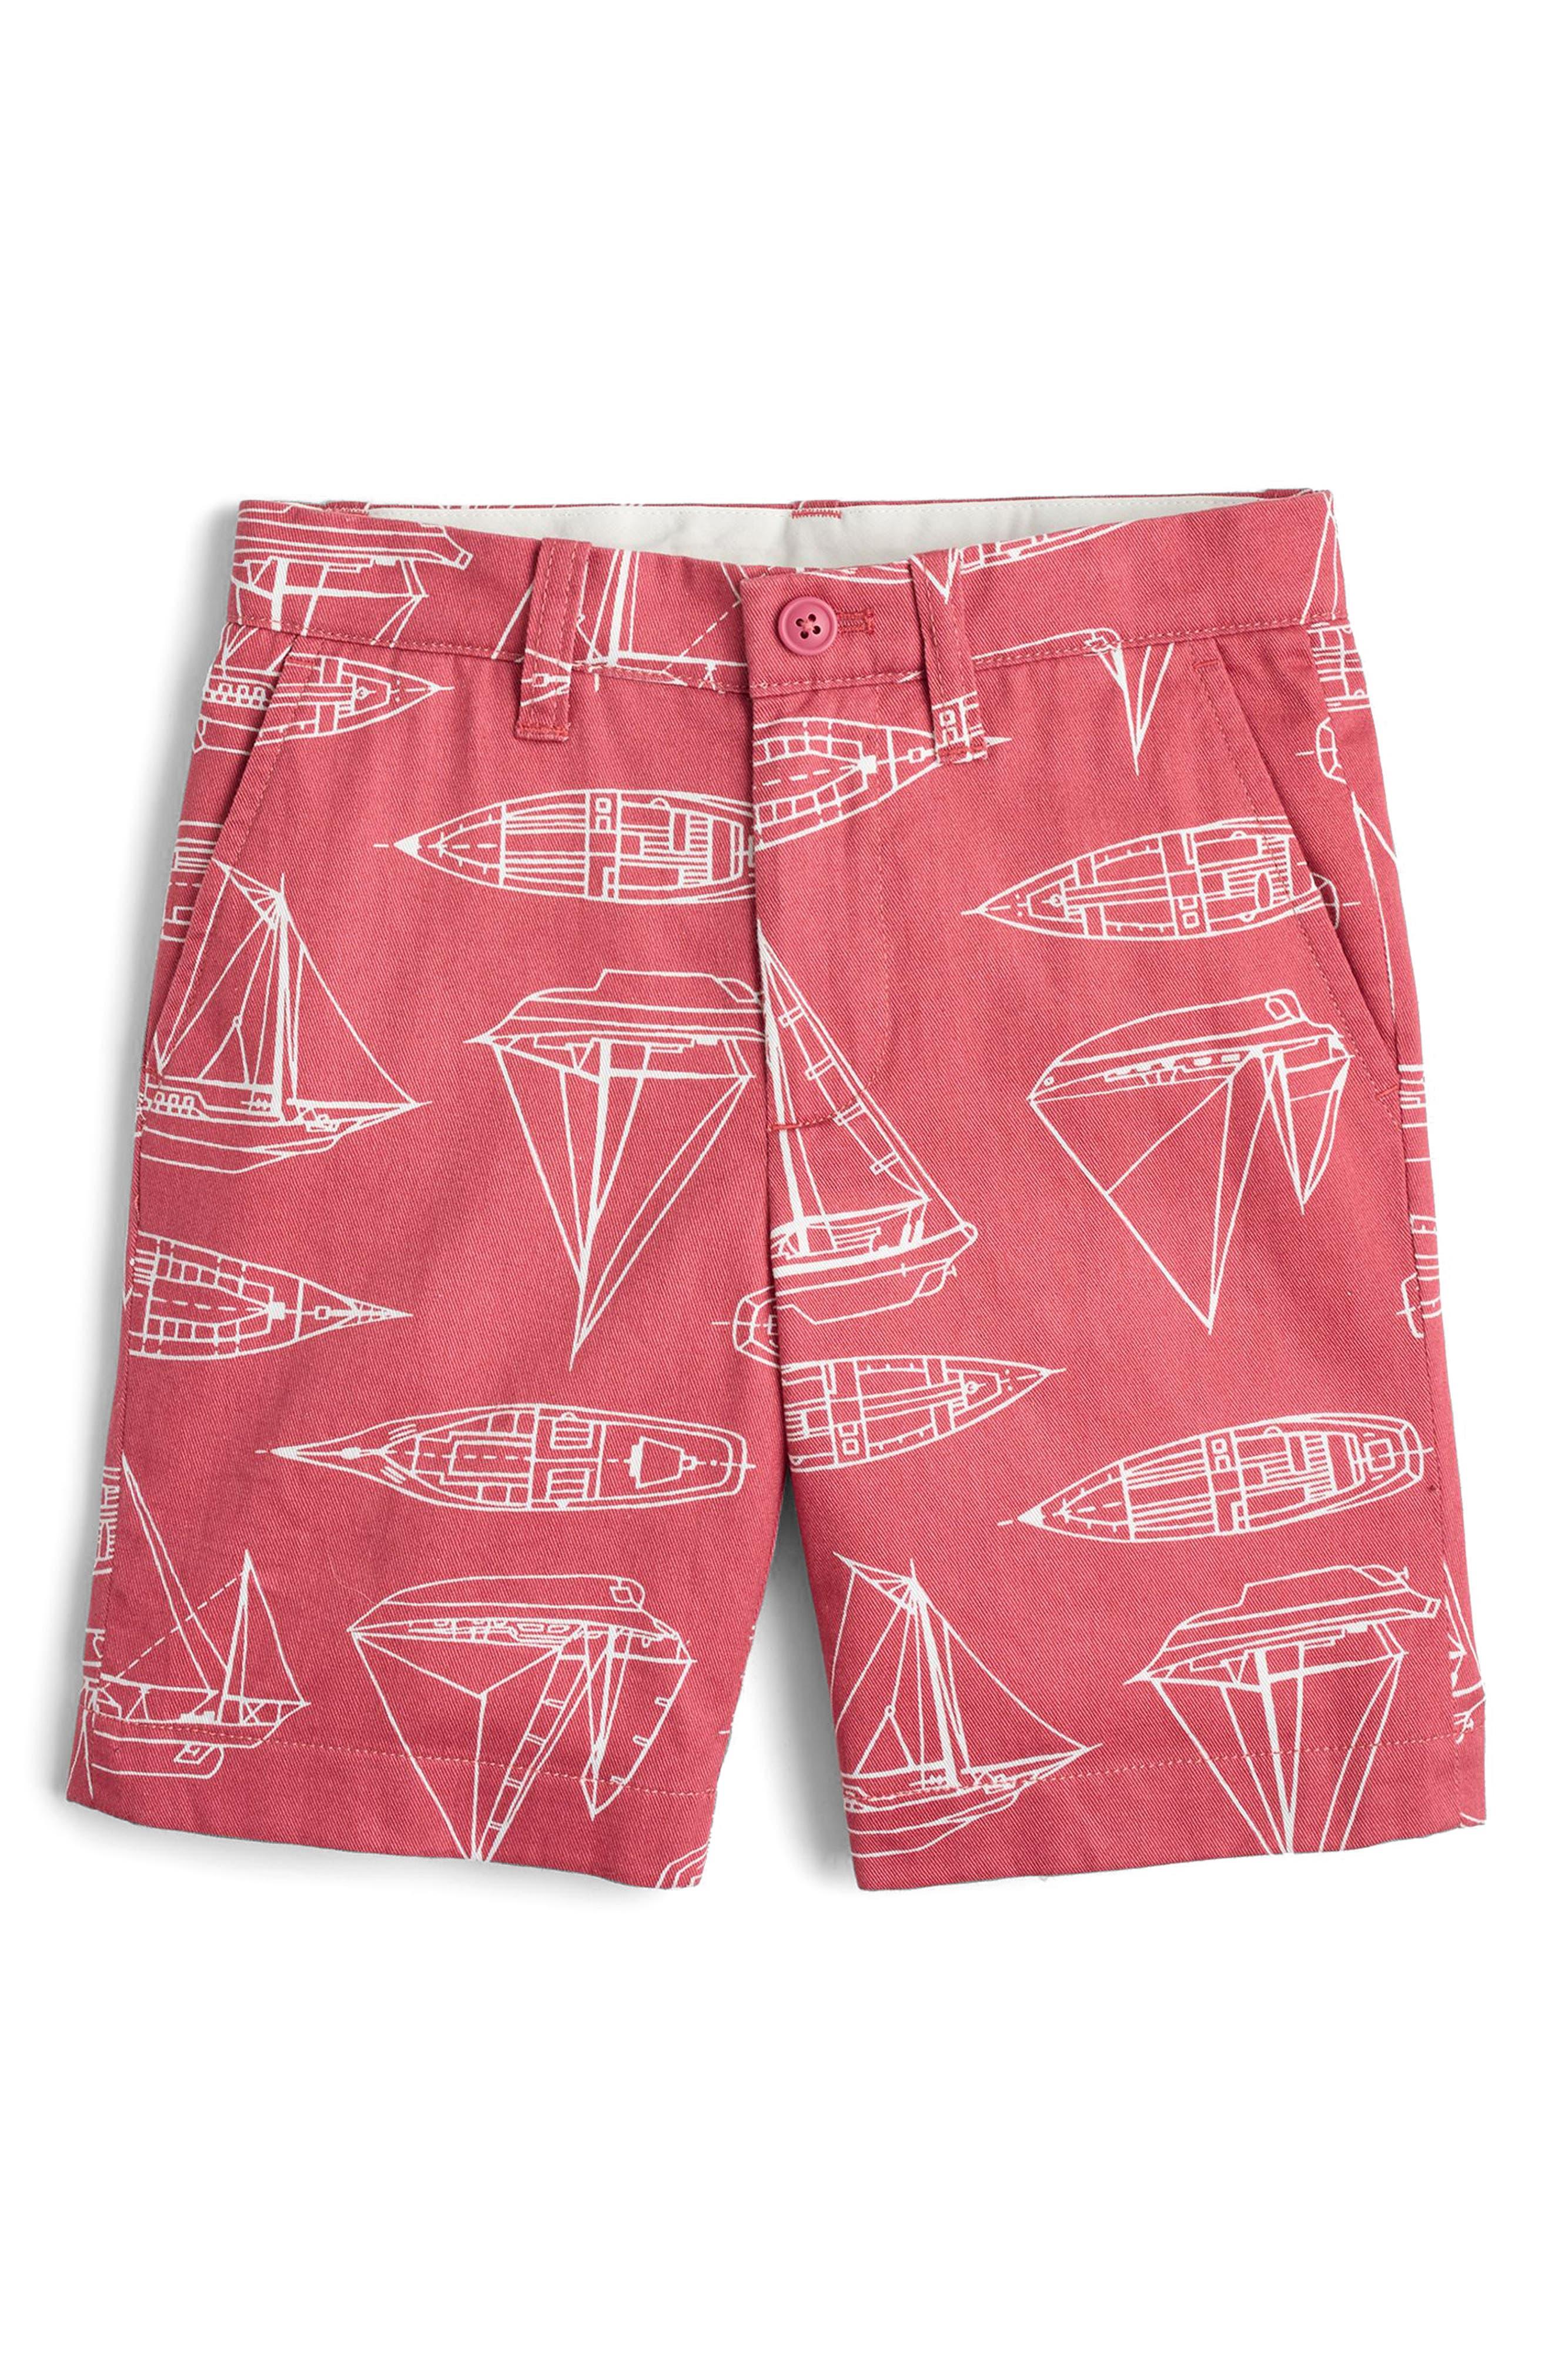 crewcuts by J.Crew Stanton Boat Print Shorts (Toddler Boys, Little Boys & Big Boys)